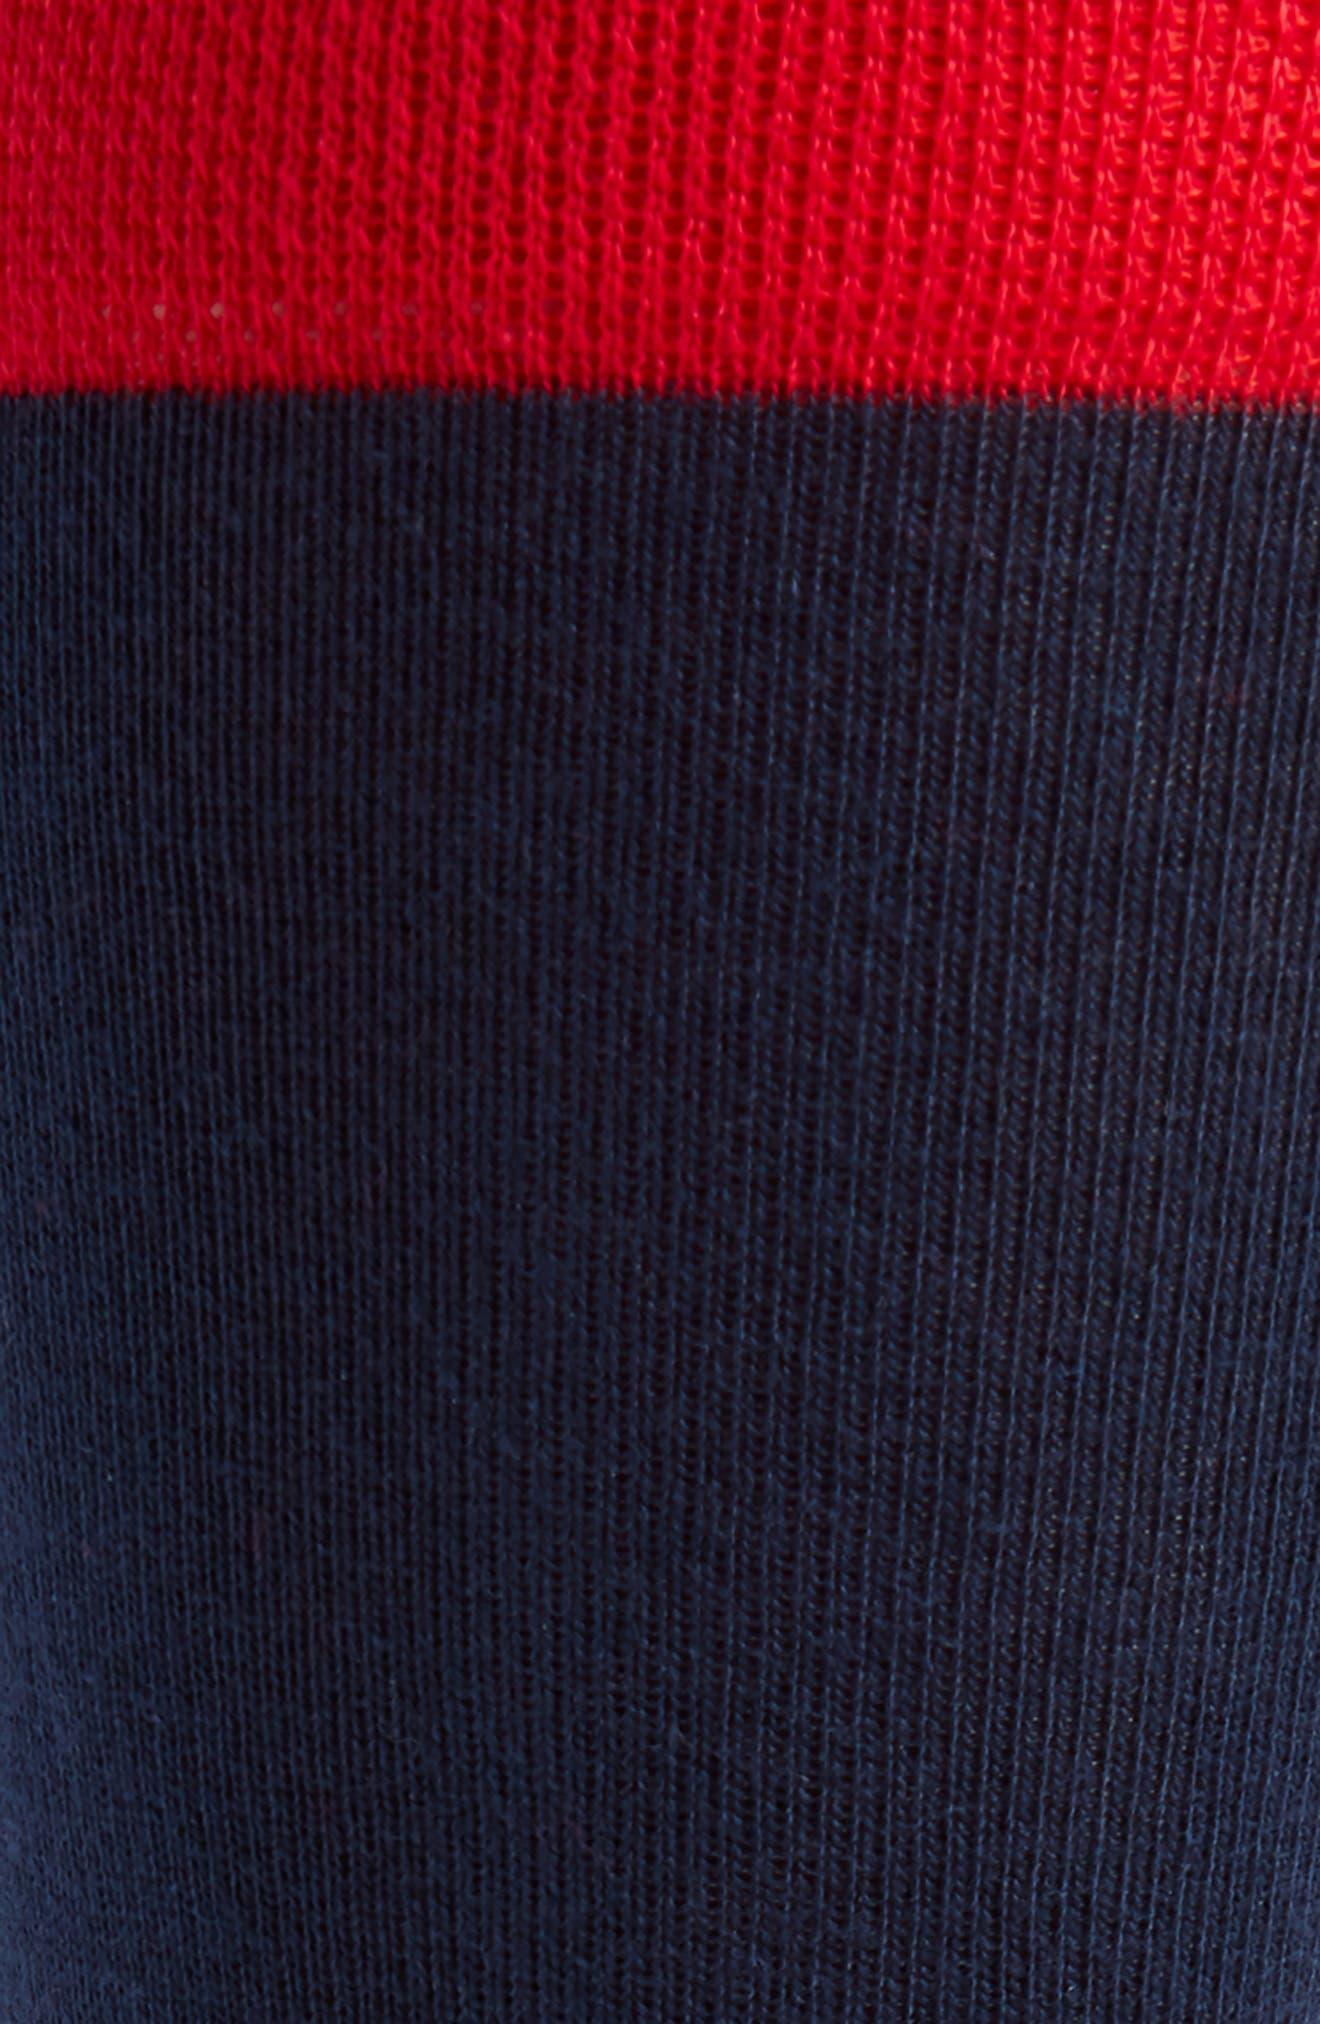 Colorblock Socks,                             Alternate thumbnail 2, color,                             Navy